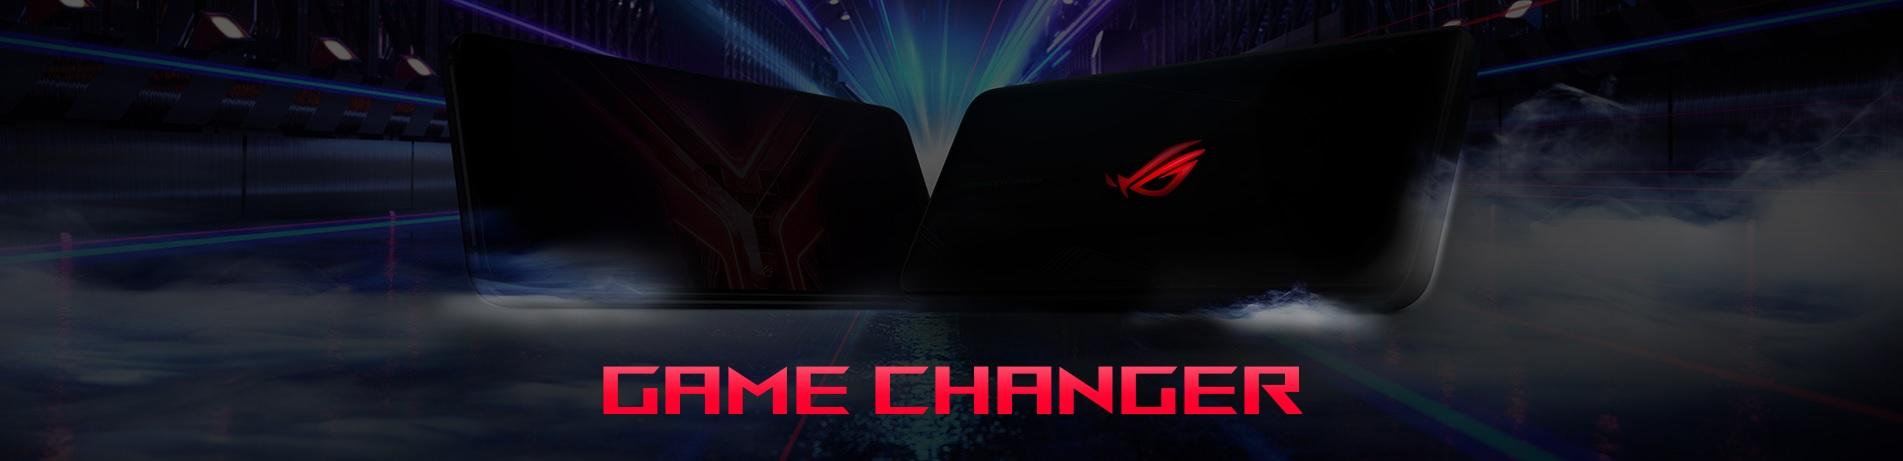 Asus ROG Phone 3 teaser